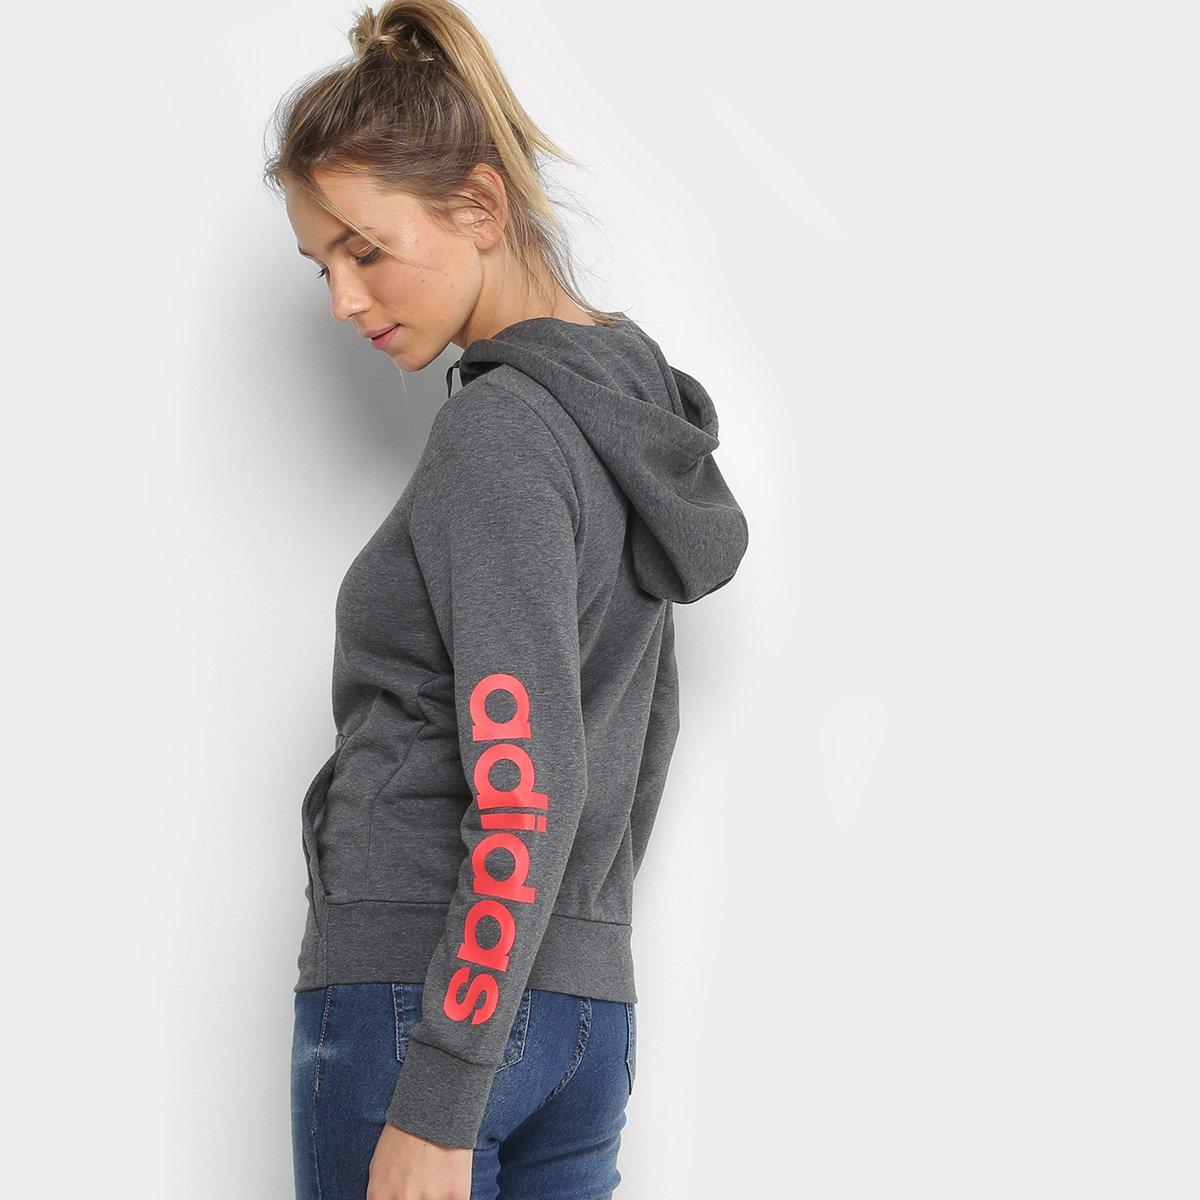 Jaqueta Adidas Ess Lin Fz Hd Estampada Feminina - Cinza - Compre ... 5a05be7421